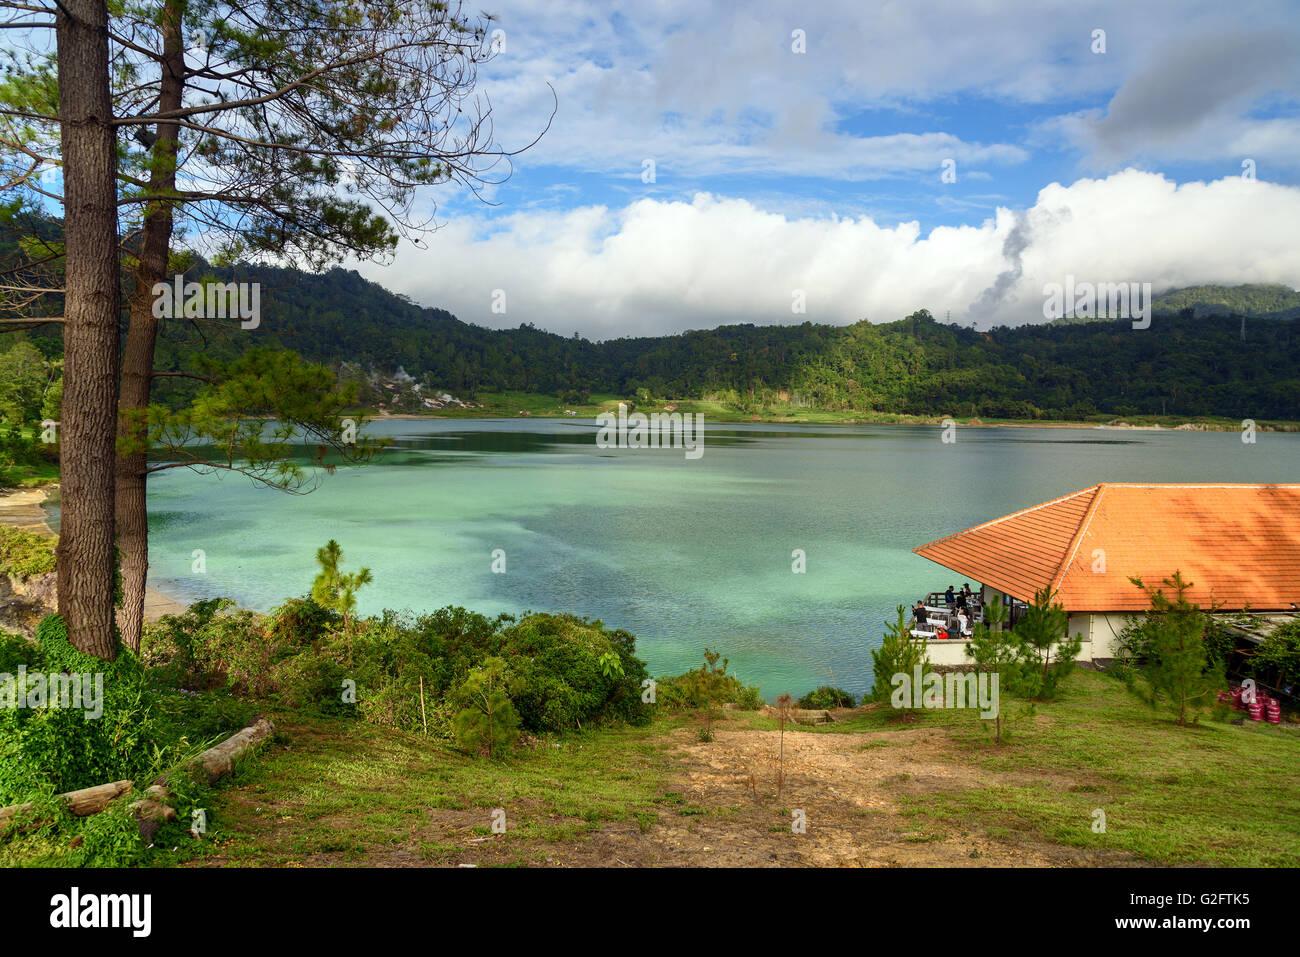 Linau lake in Tomohon. North Sulawesi. Indonesia - Stock Image